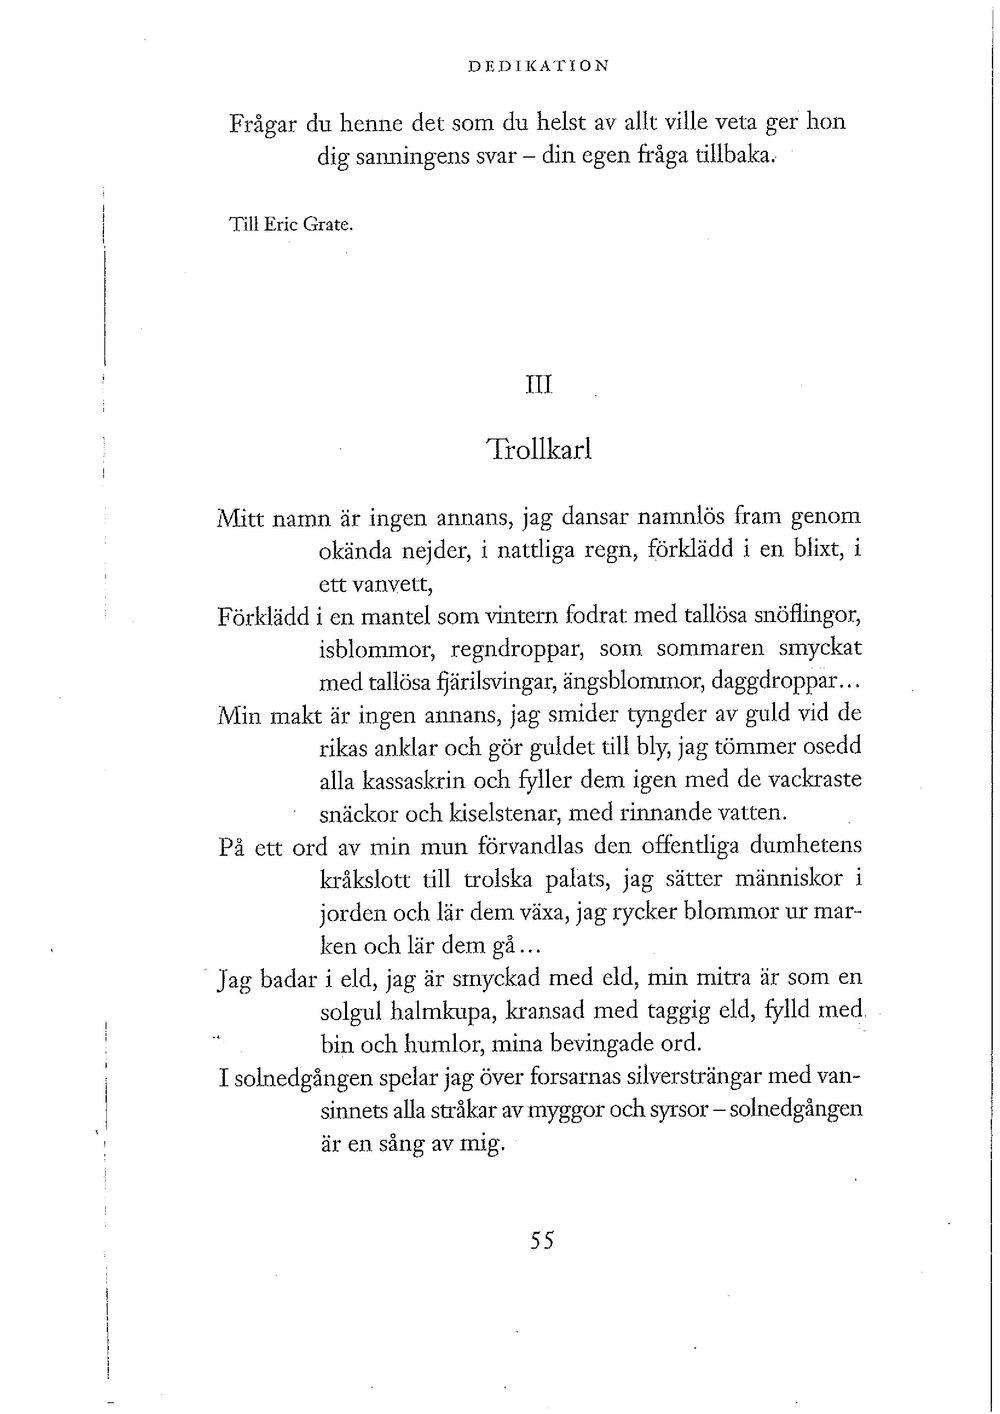 Ljung-page-002.jpg